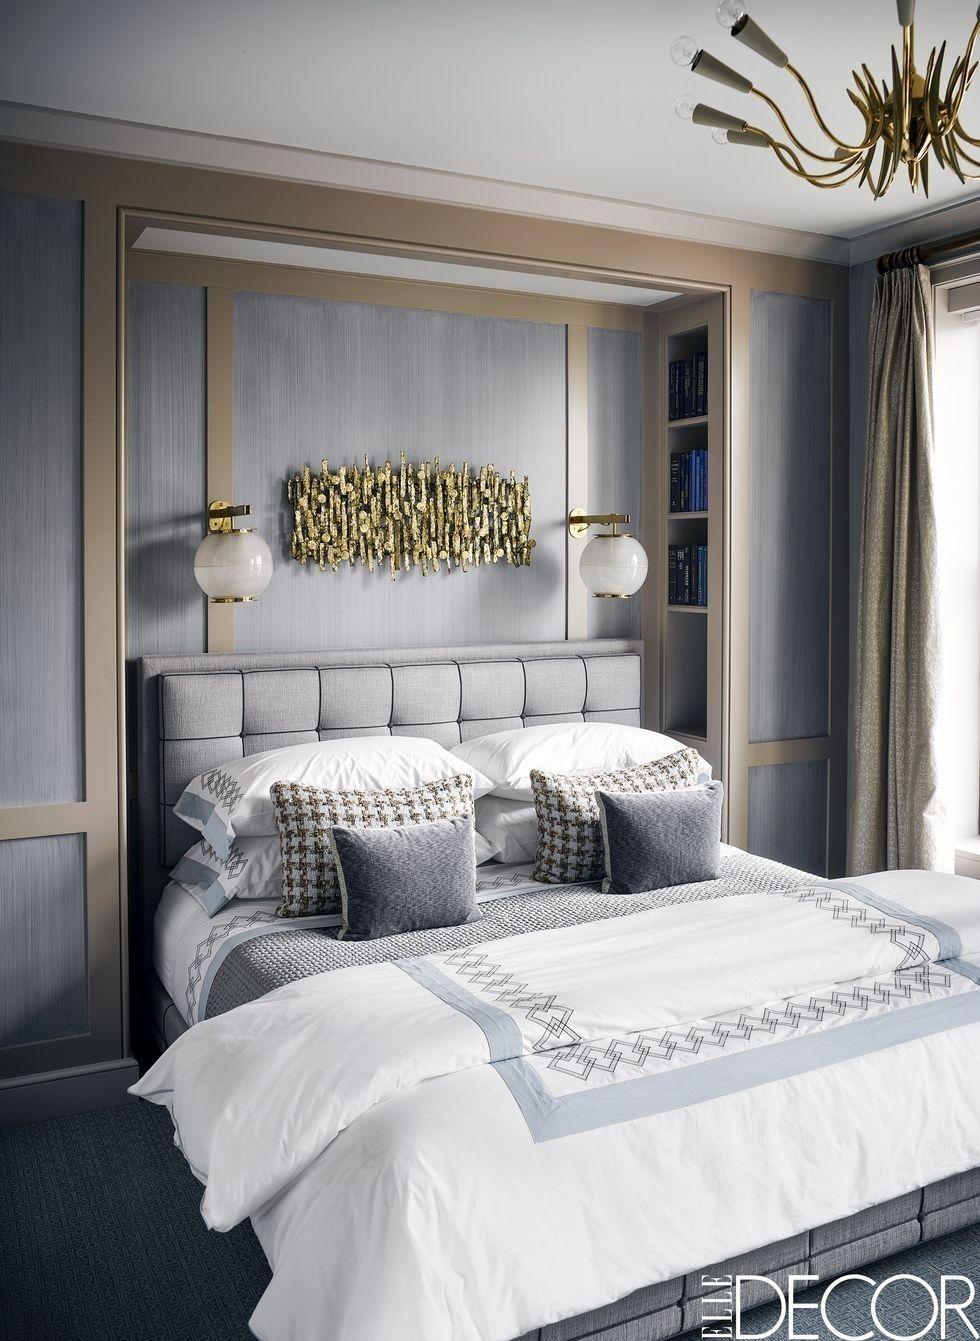 Bedroom lamp decor ideas